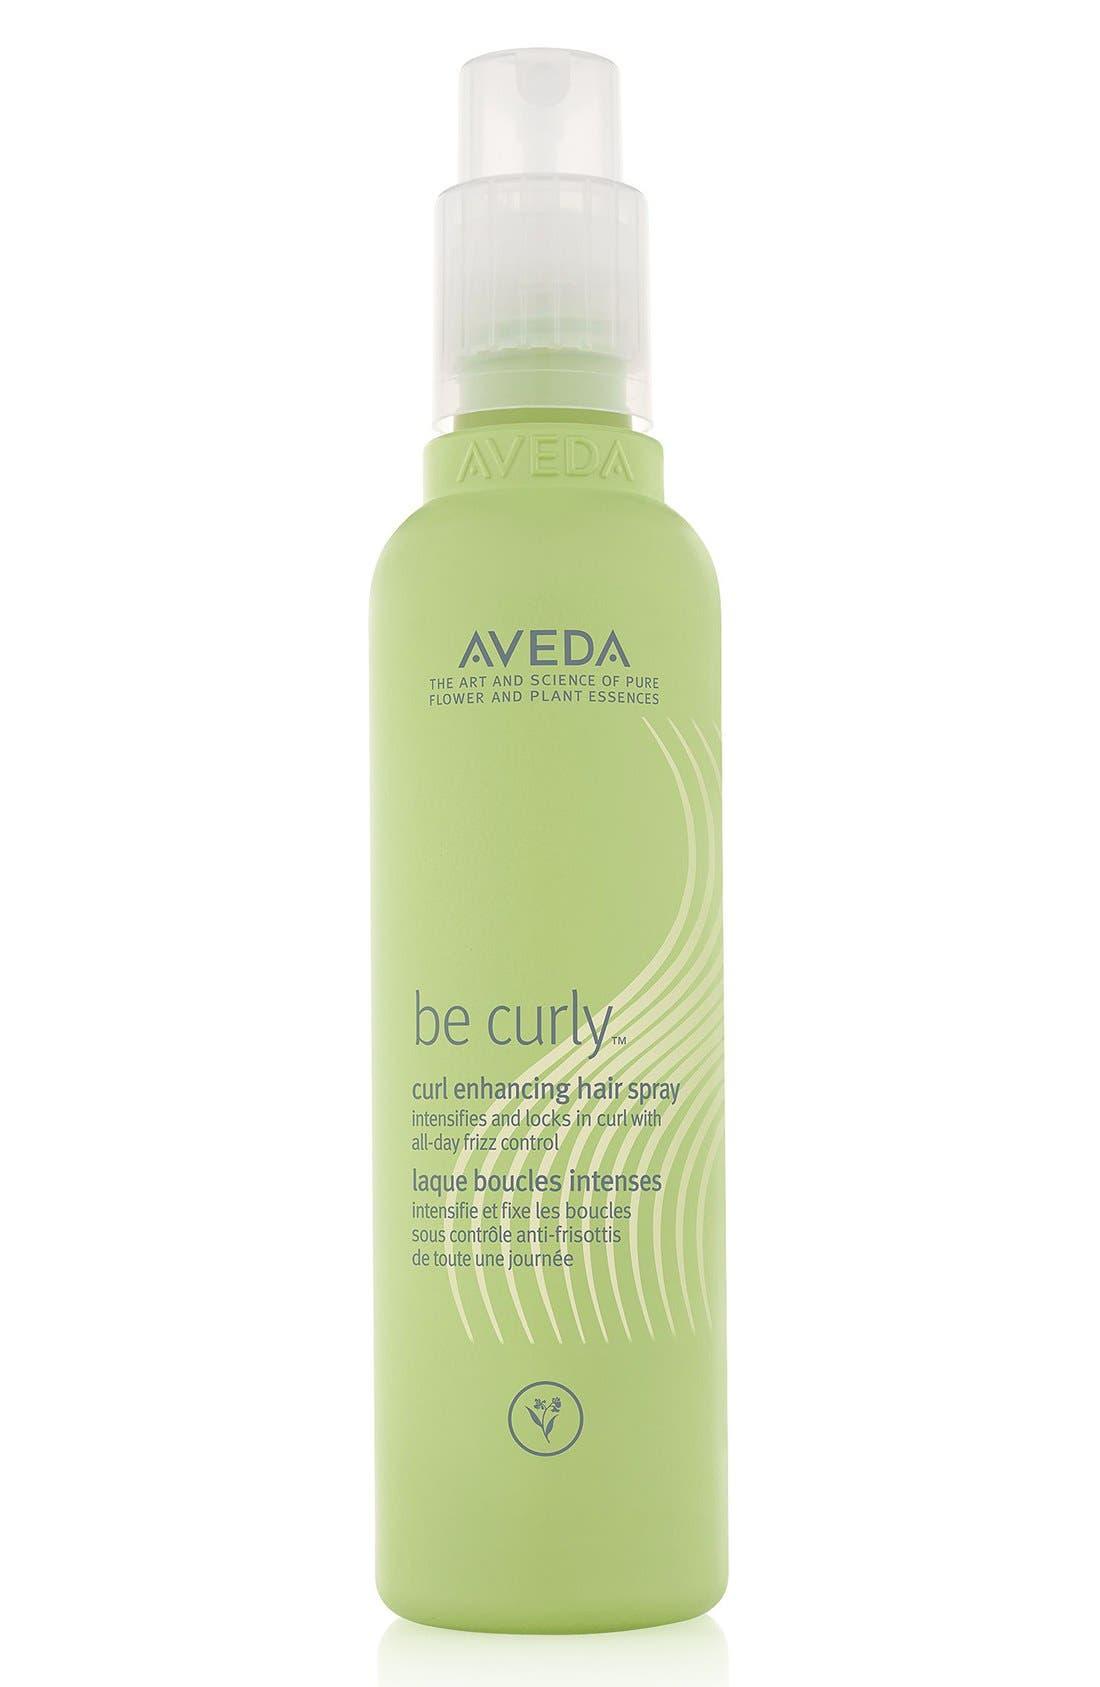 Aveda be curly™ Curl Enhancing Spray